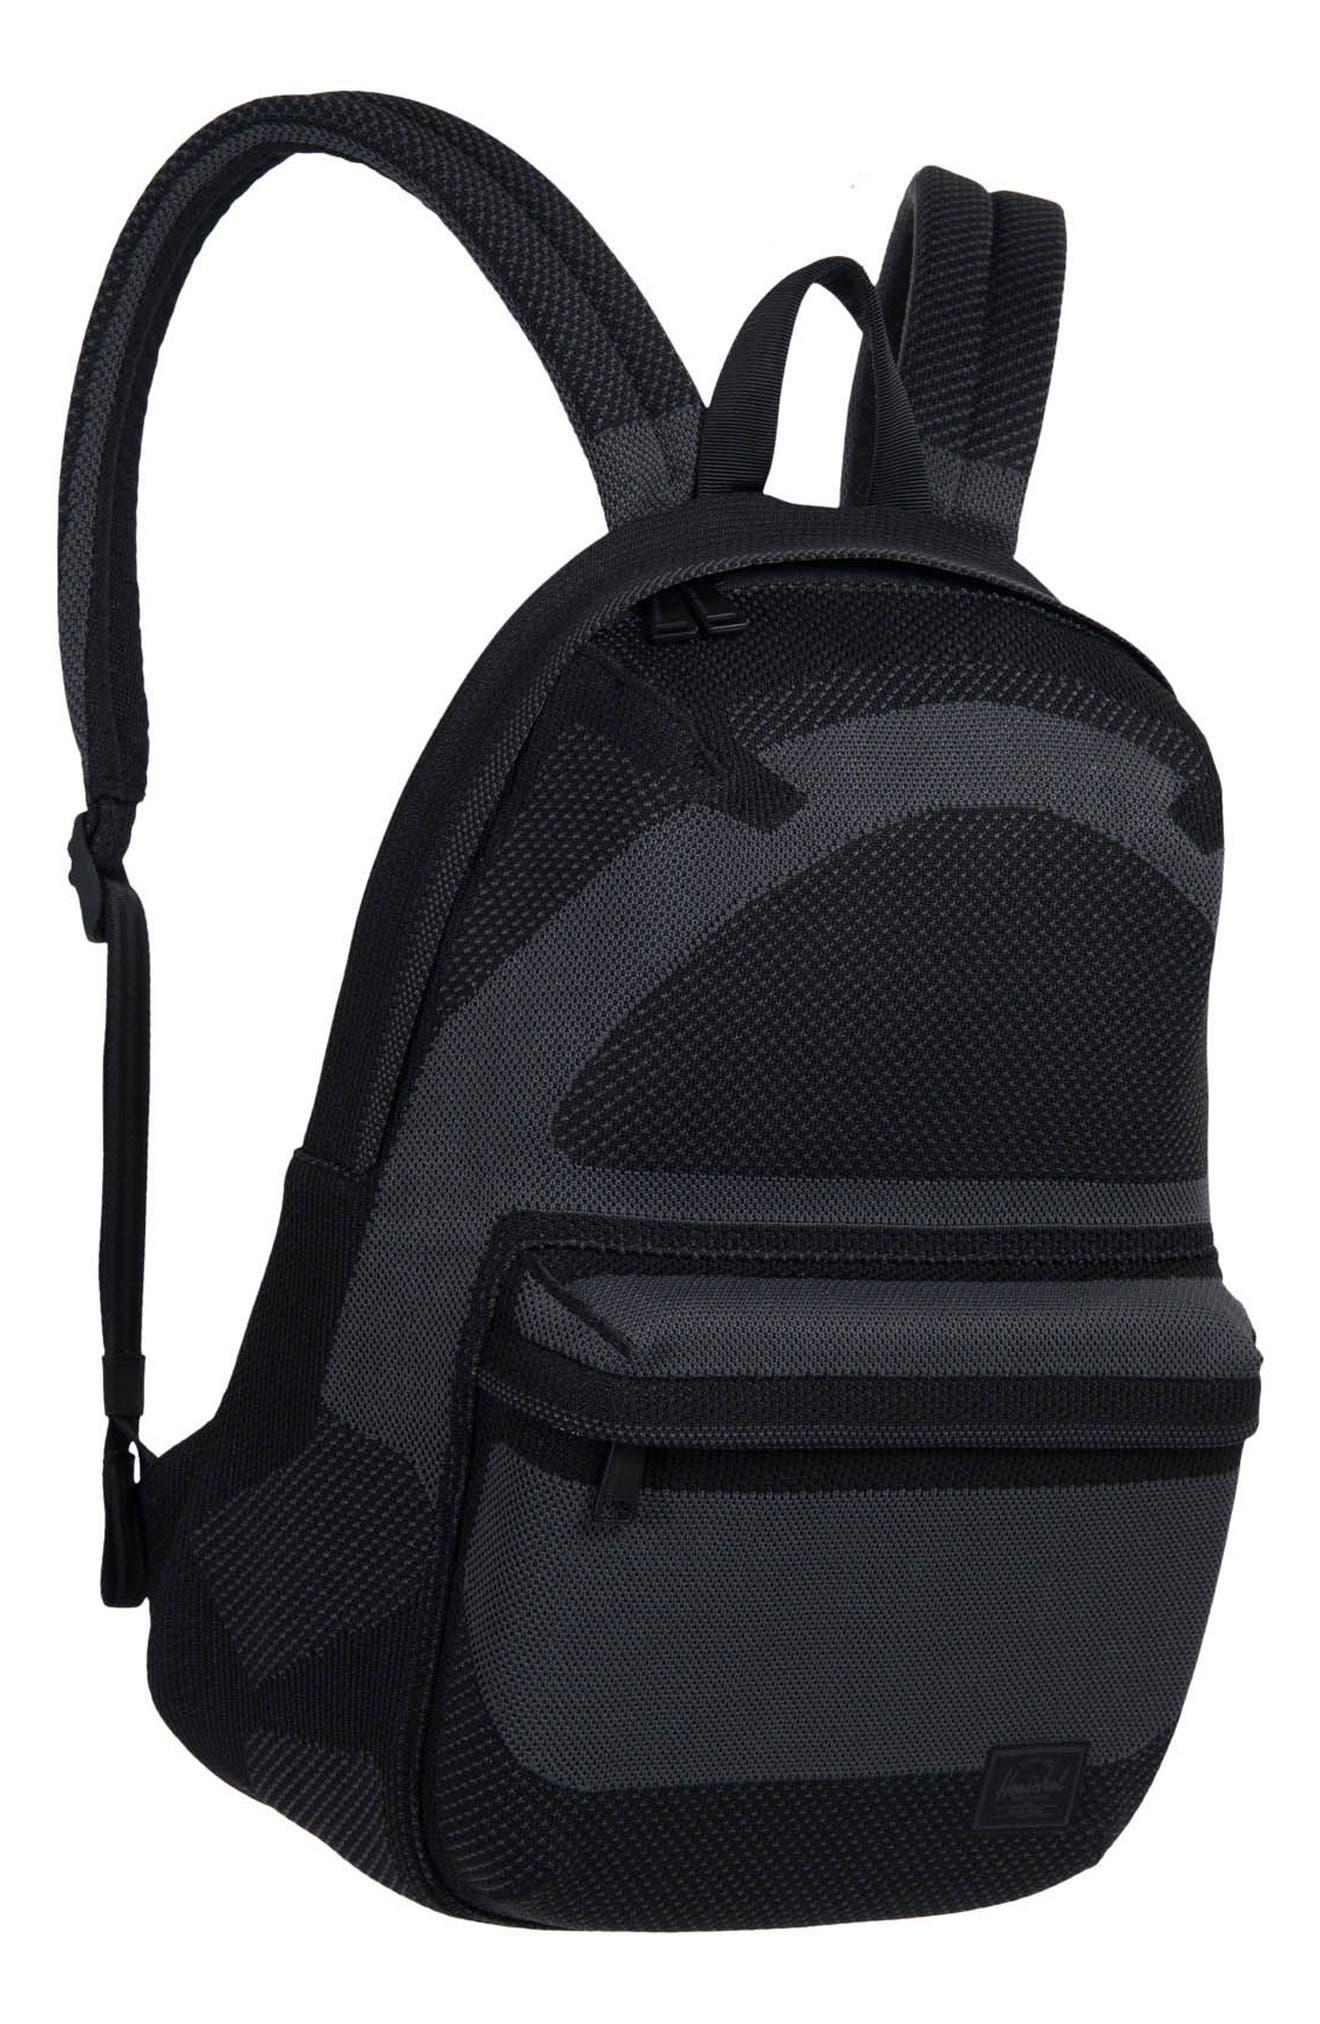 Apex Lawson Backpack,                         Main,                         color, Black Beauty/ Dark Shadow